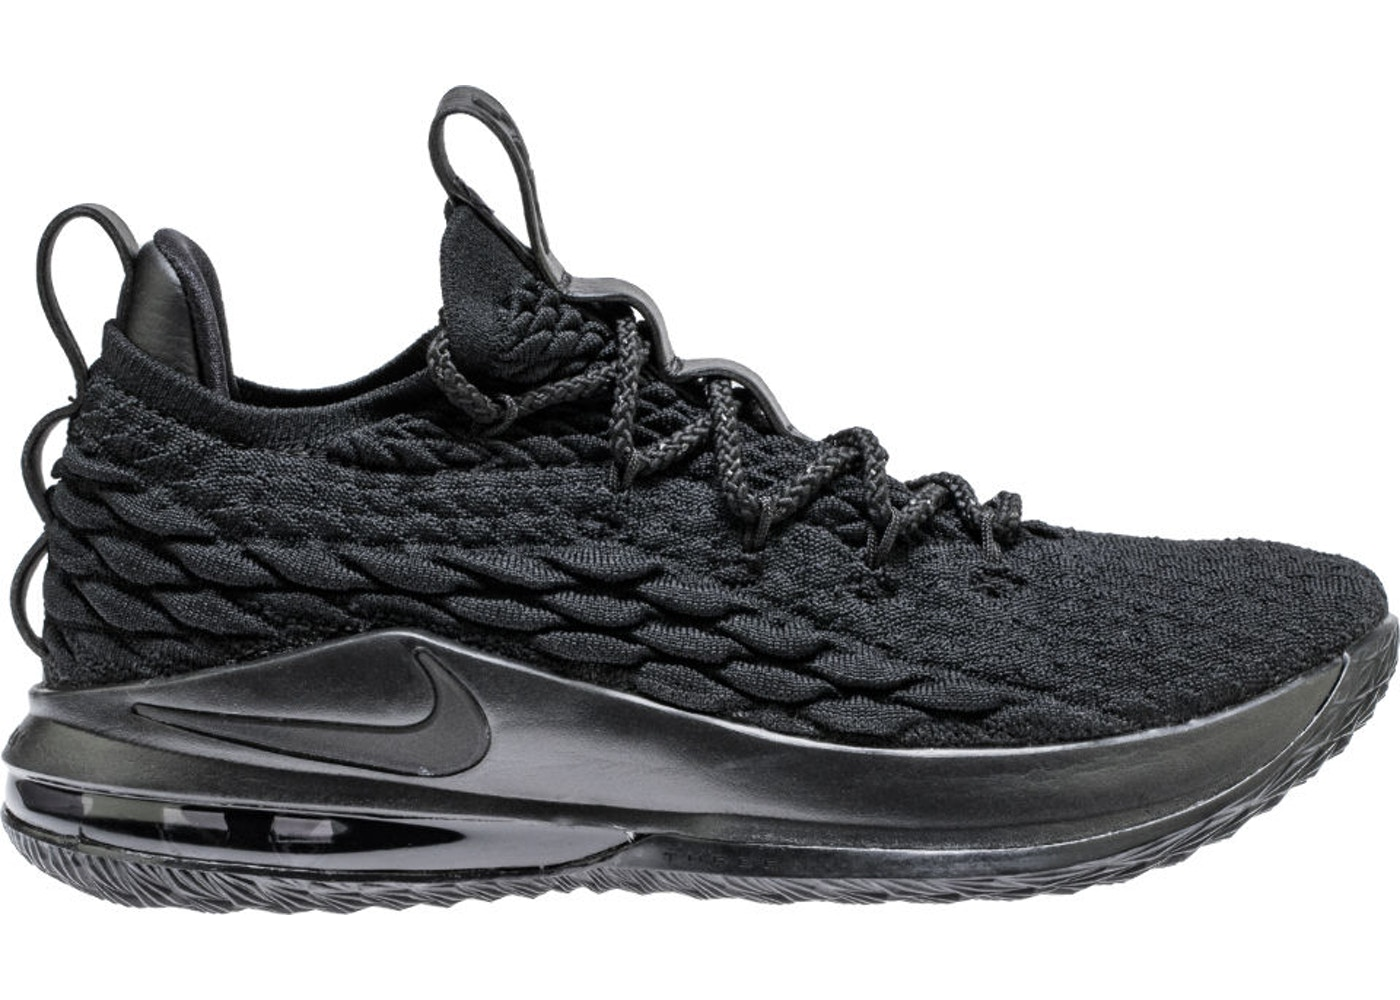 fedb69f27dfa Buy Nike LeBron 15 Shoes   Deadstock Sneakers